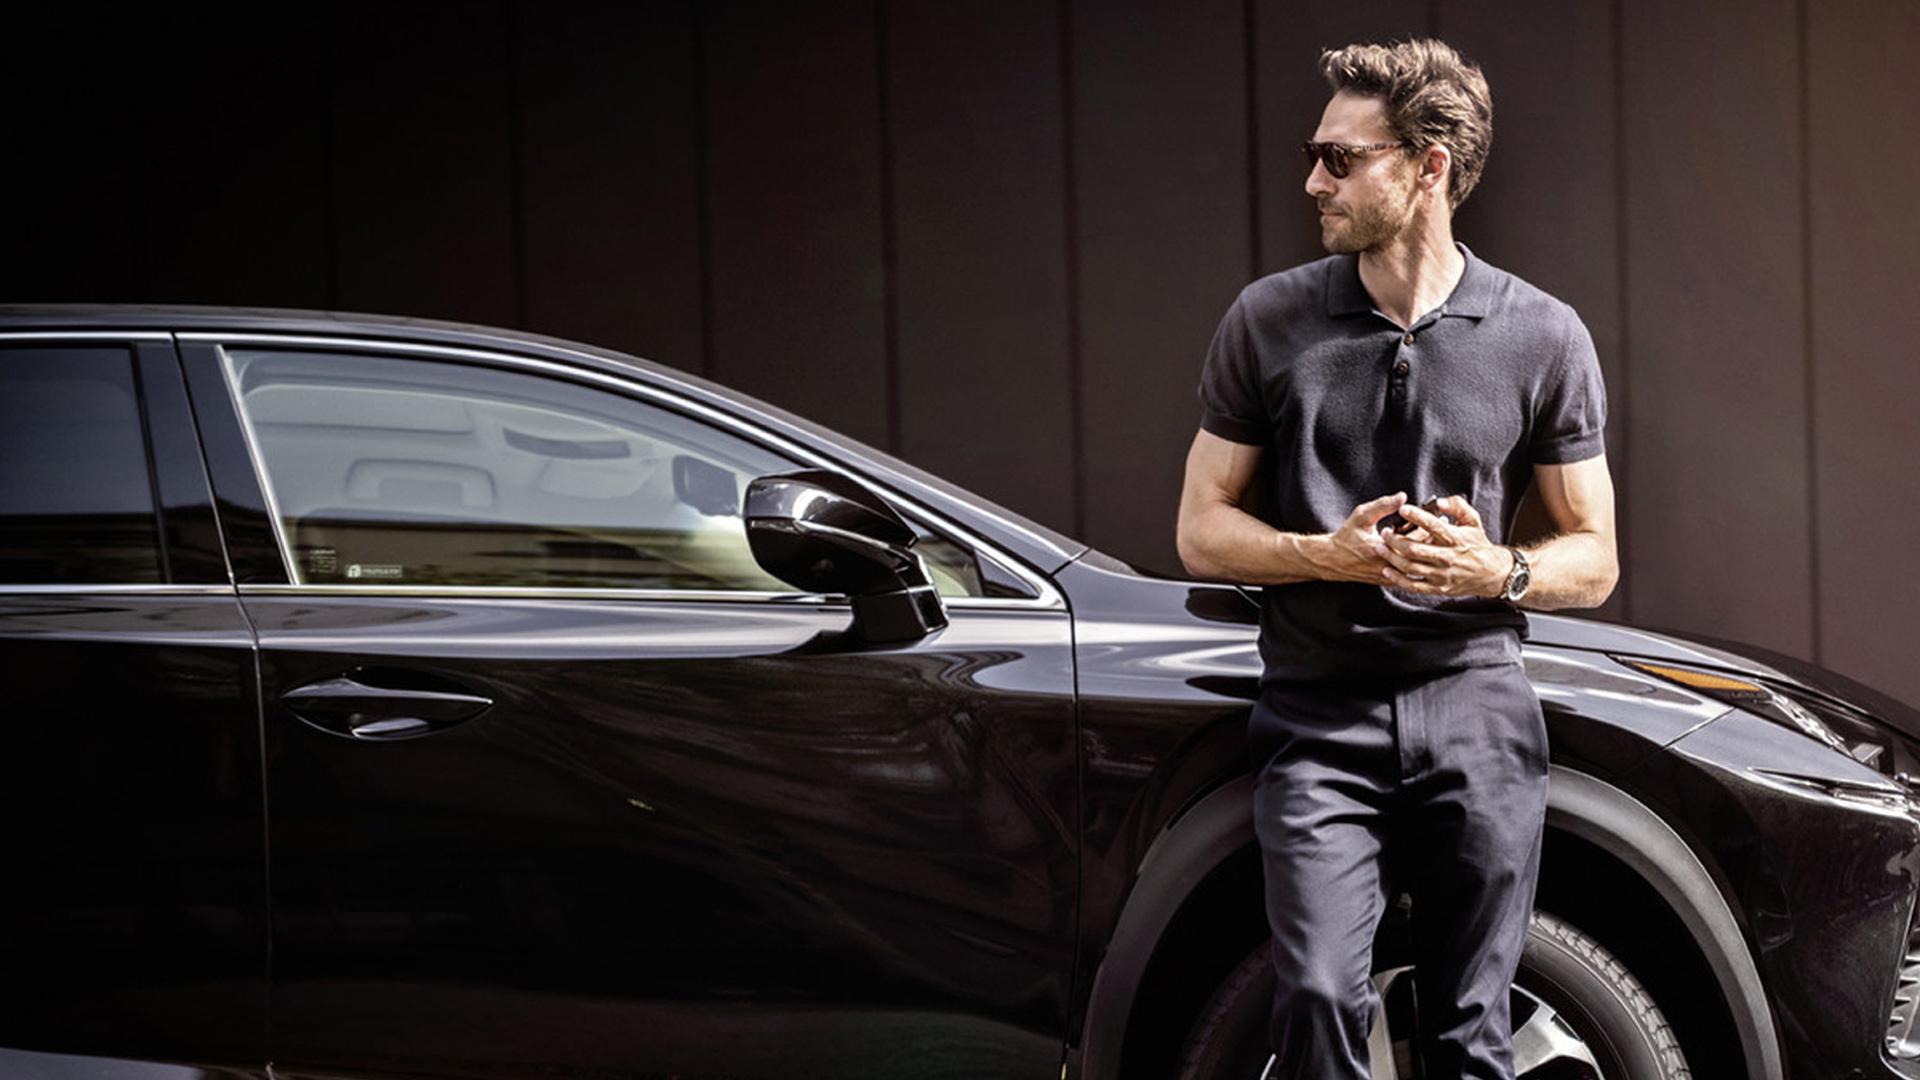 descubra lexus full drive | garantía | lexus españa